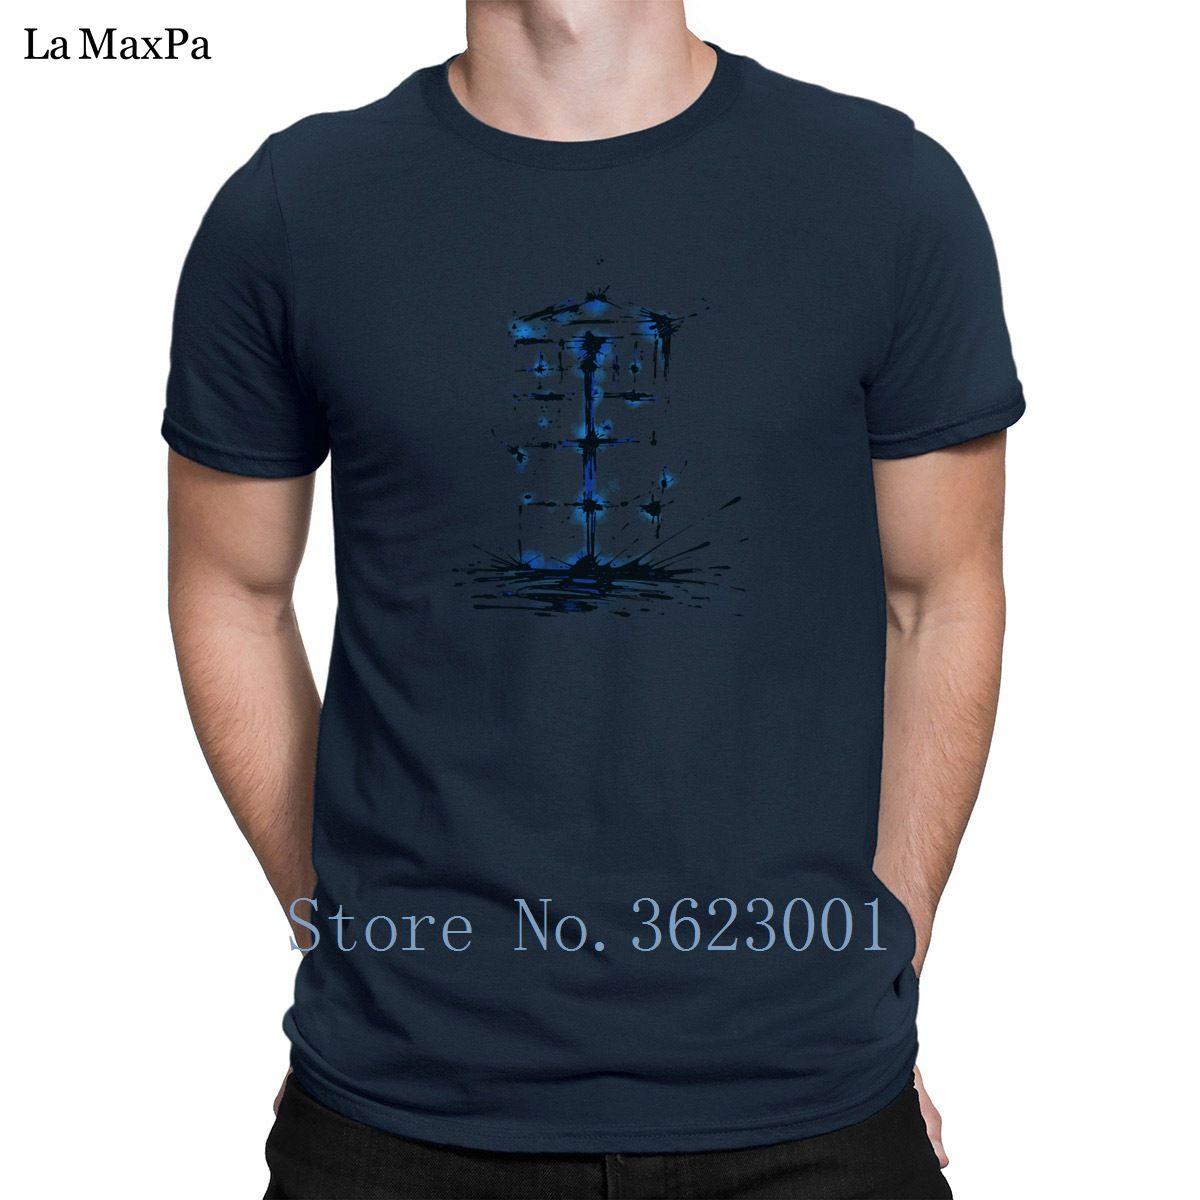 Família de projetar Slogan Camiseta Splaaash Series Blue Box Ink T-shirt de algodão anti-rugas Homens 2018 Moda